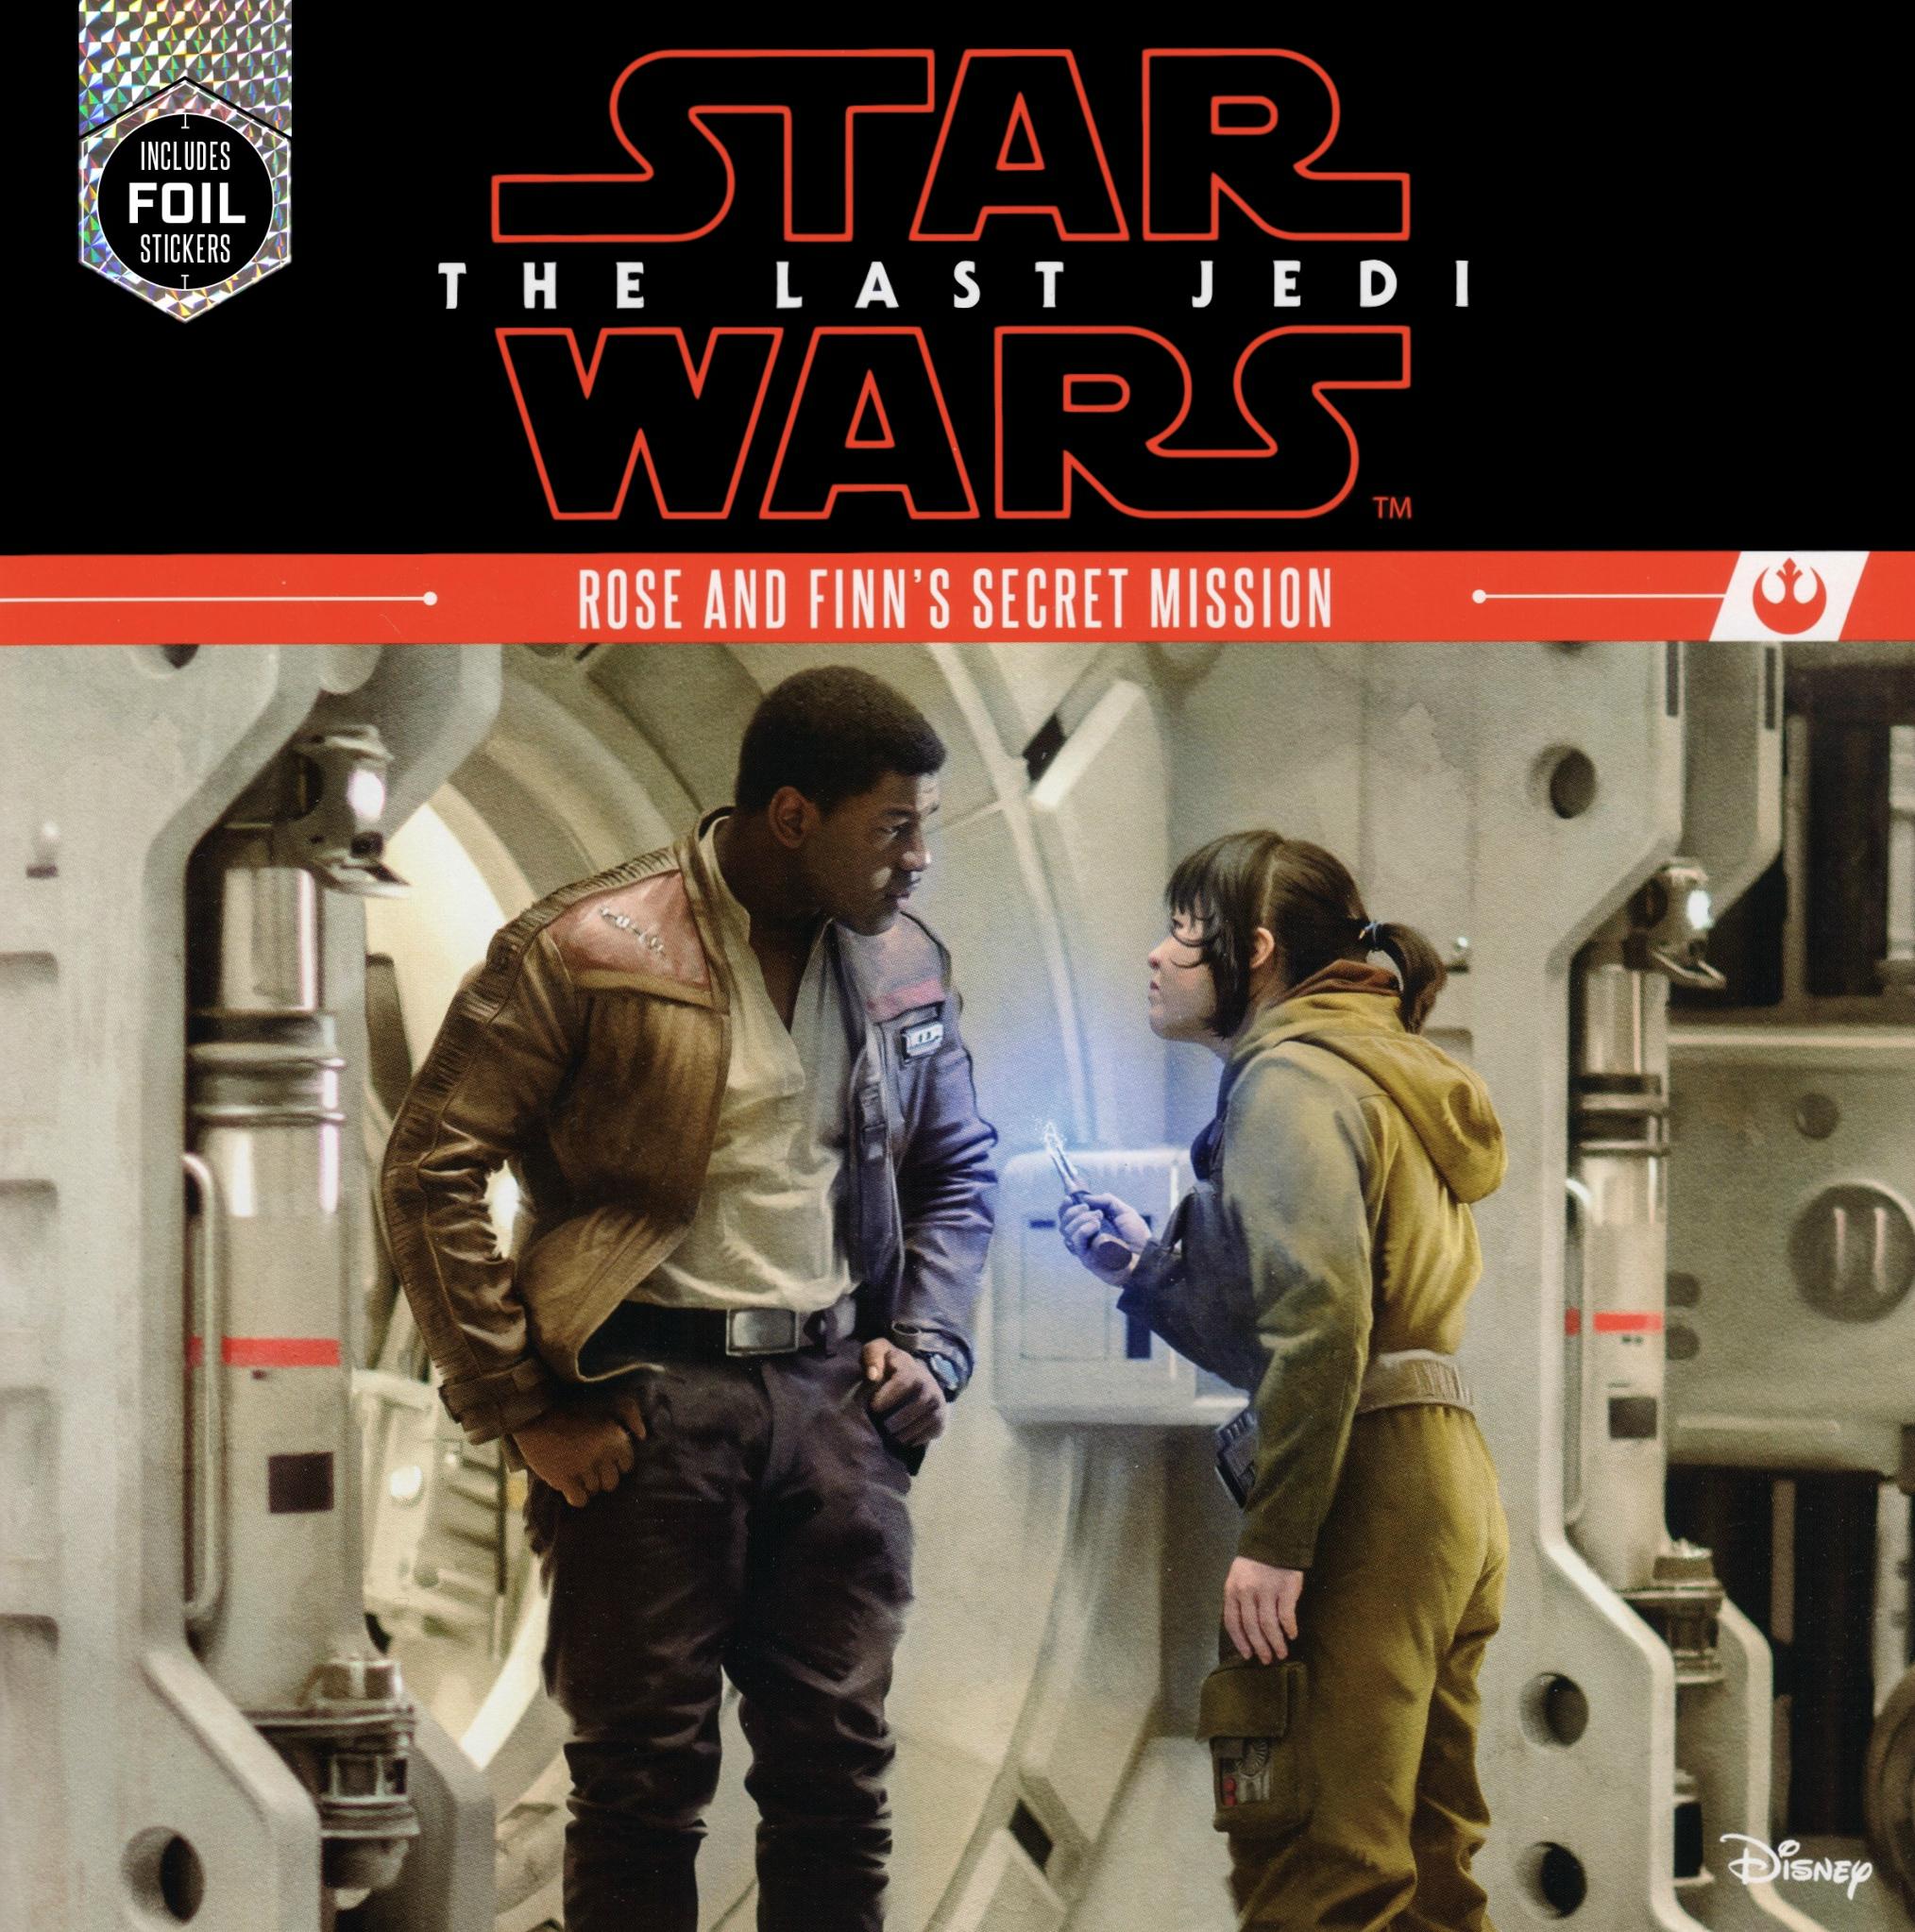 The Last Jedi: Rose and Finn's Secret Mission